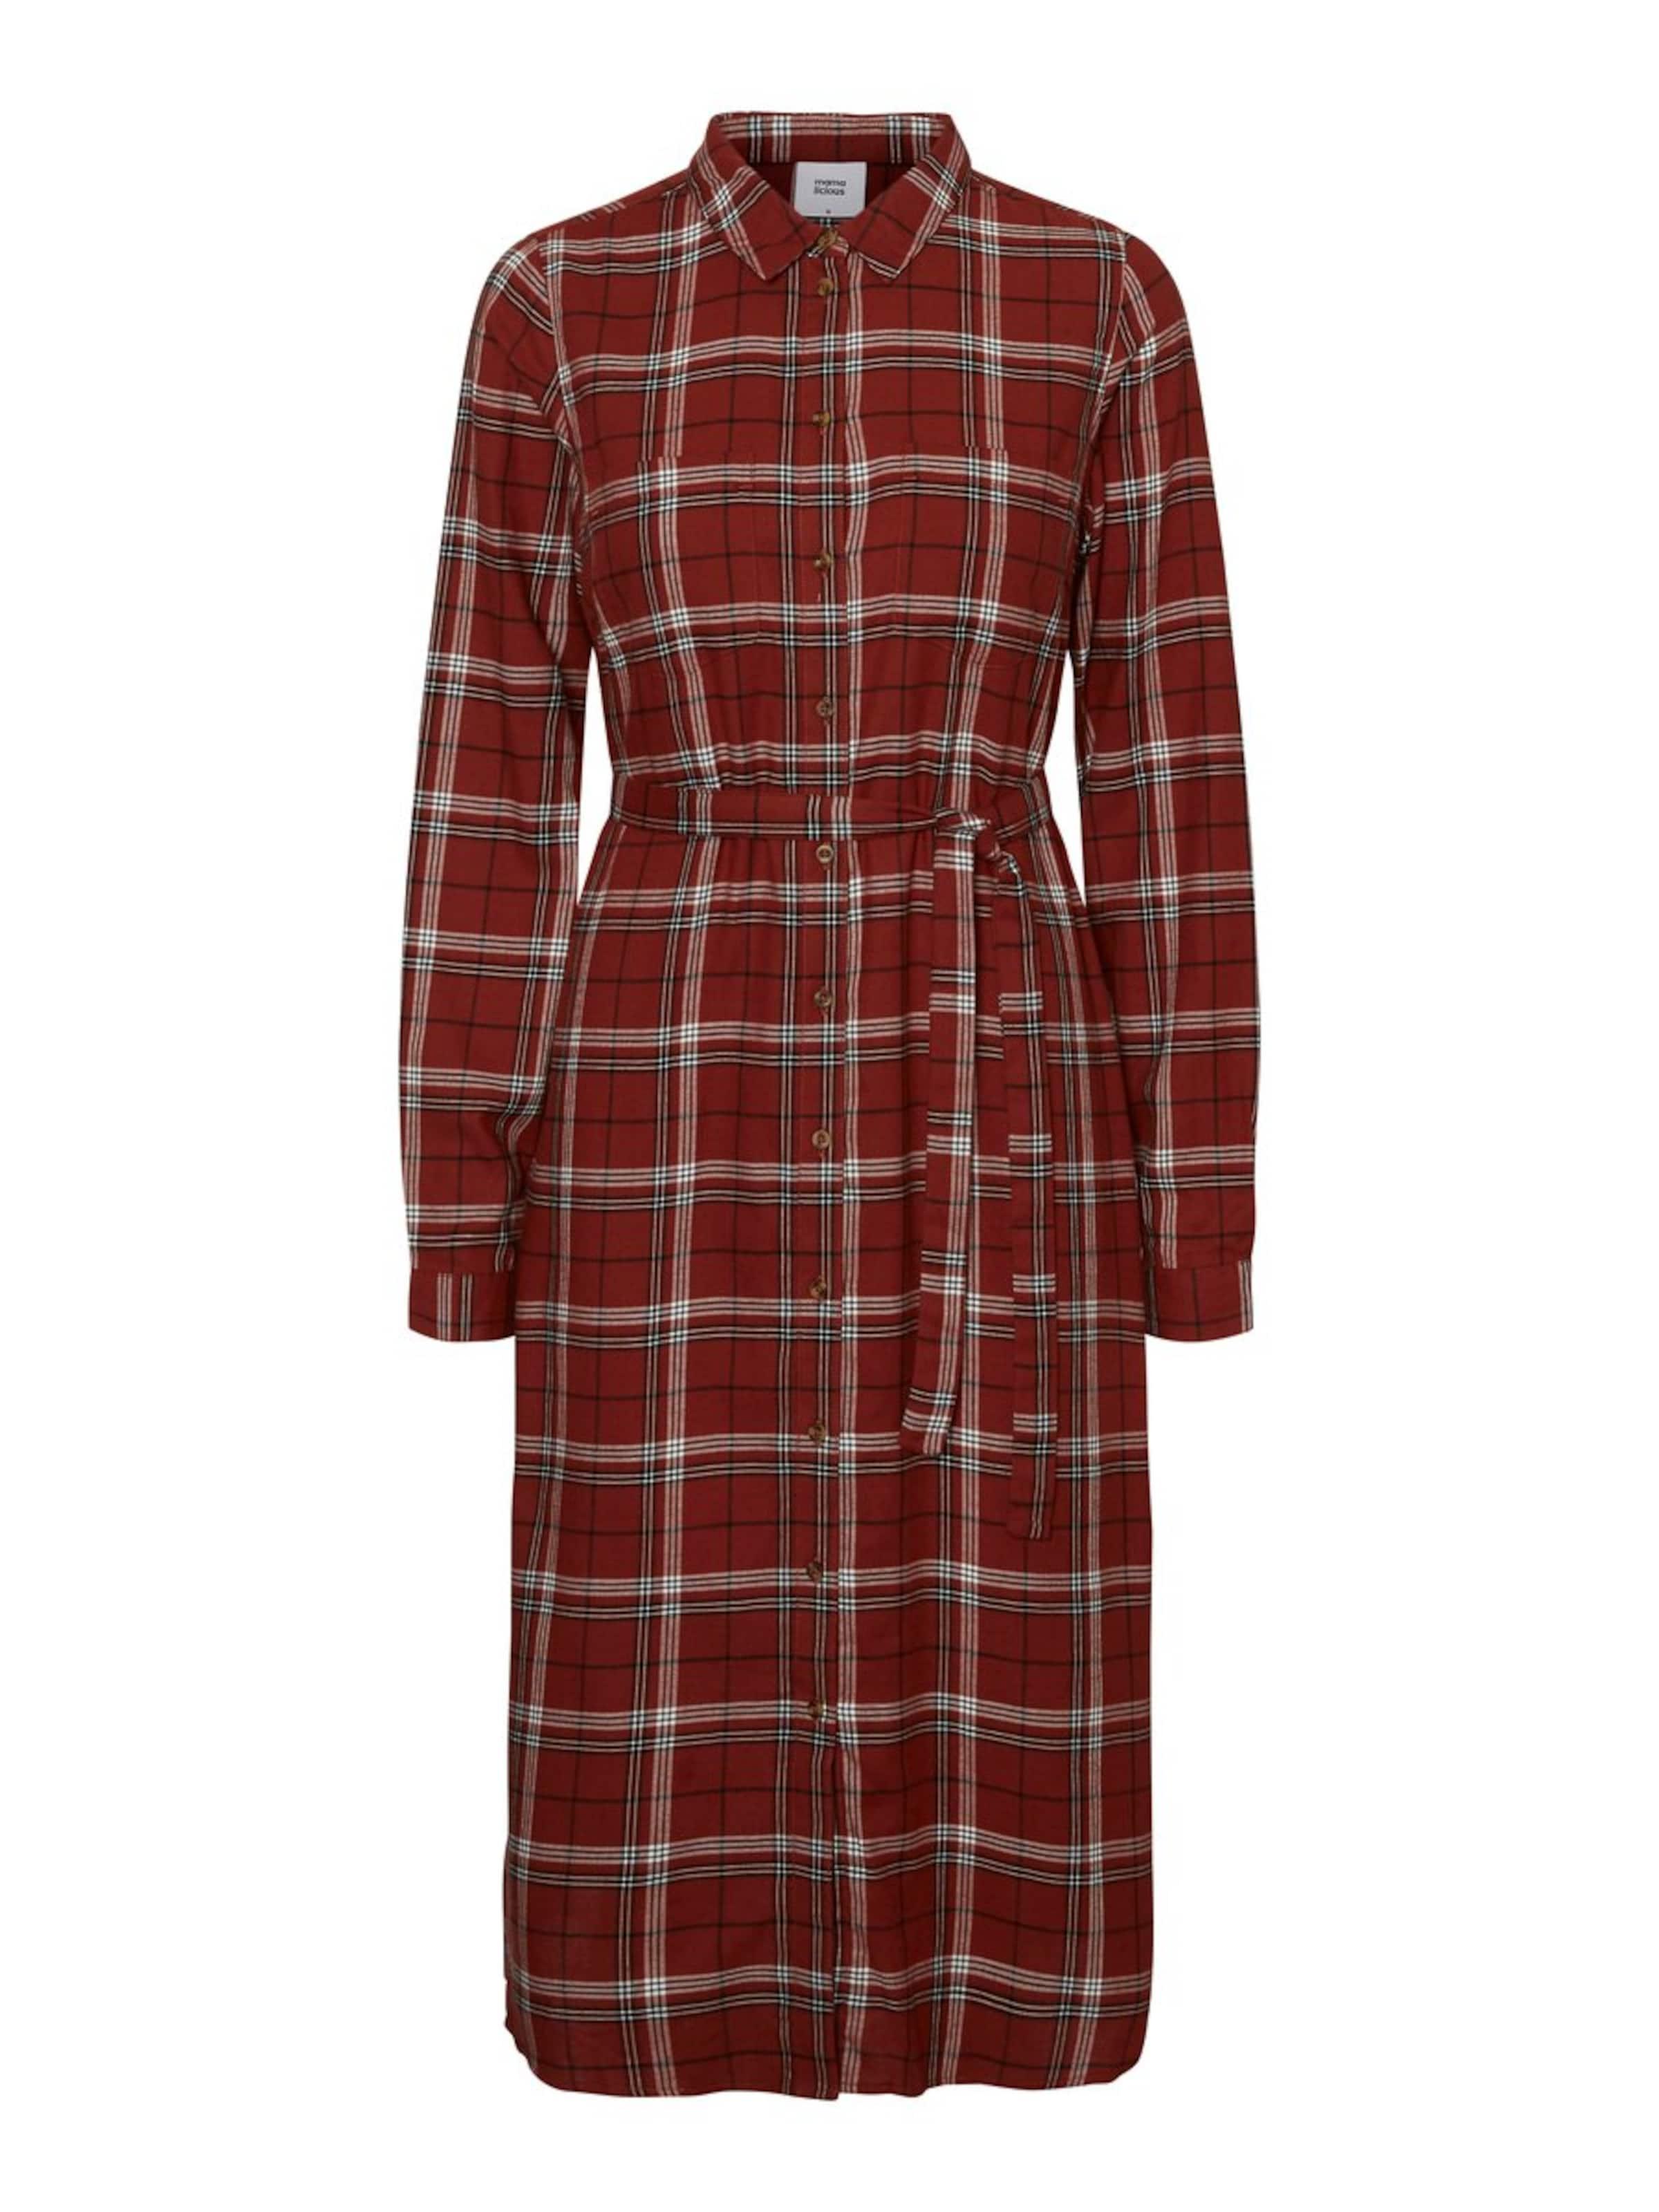 Mamalicious chemise Robe CeriseNoir En Blanc Rouge JTlK3uF1c